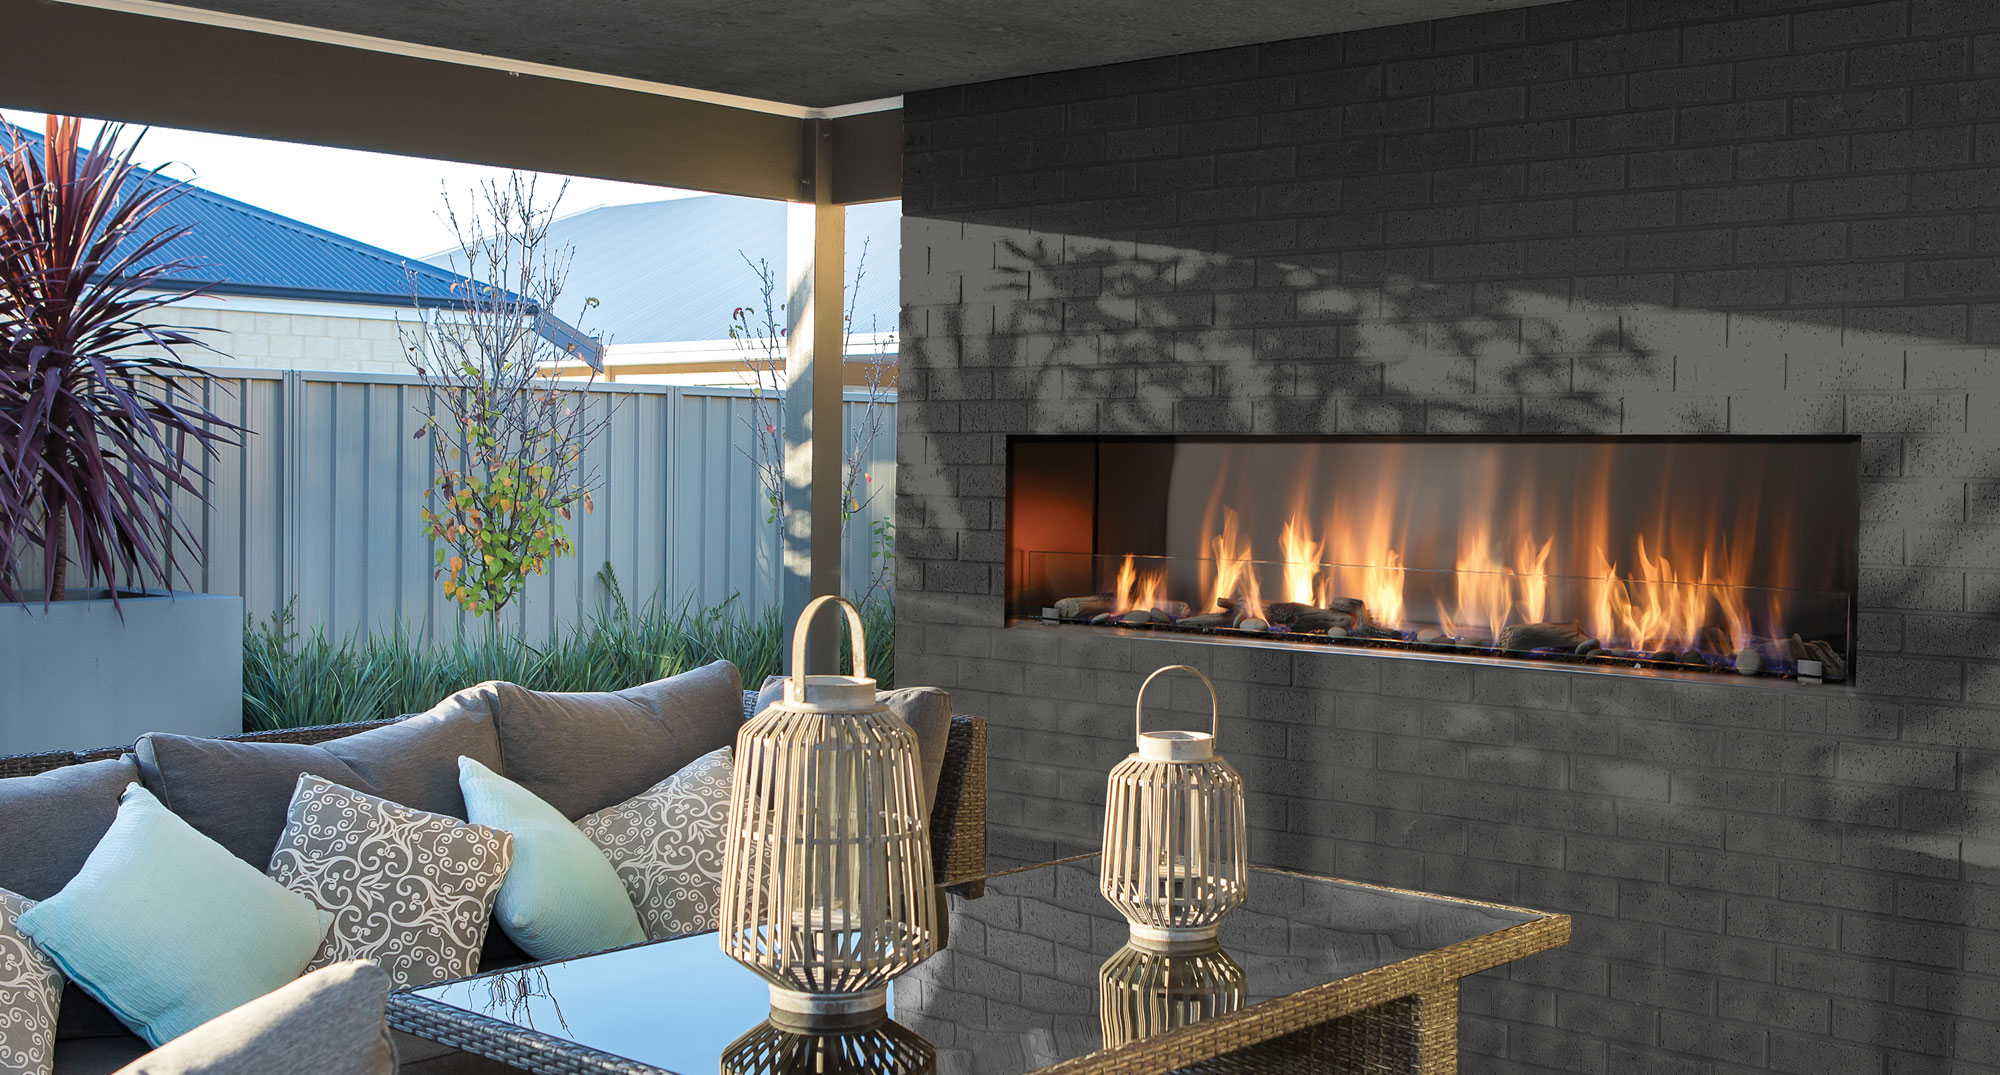 Okells Fireplace Elegant Outdoor Linear Fireplace Charming Fireplace